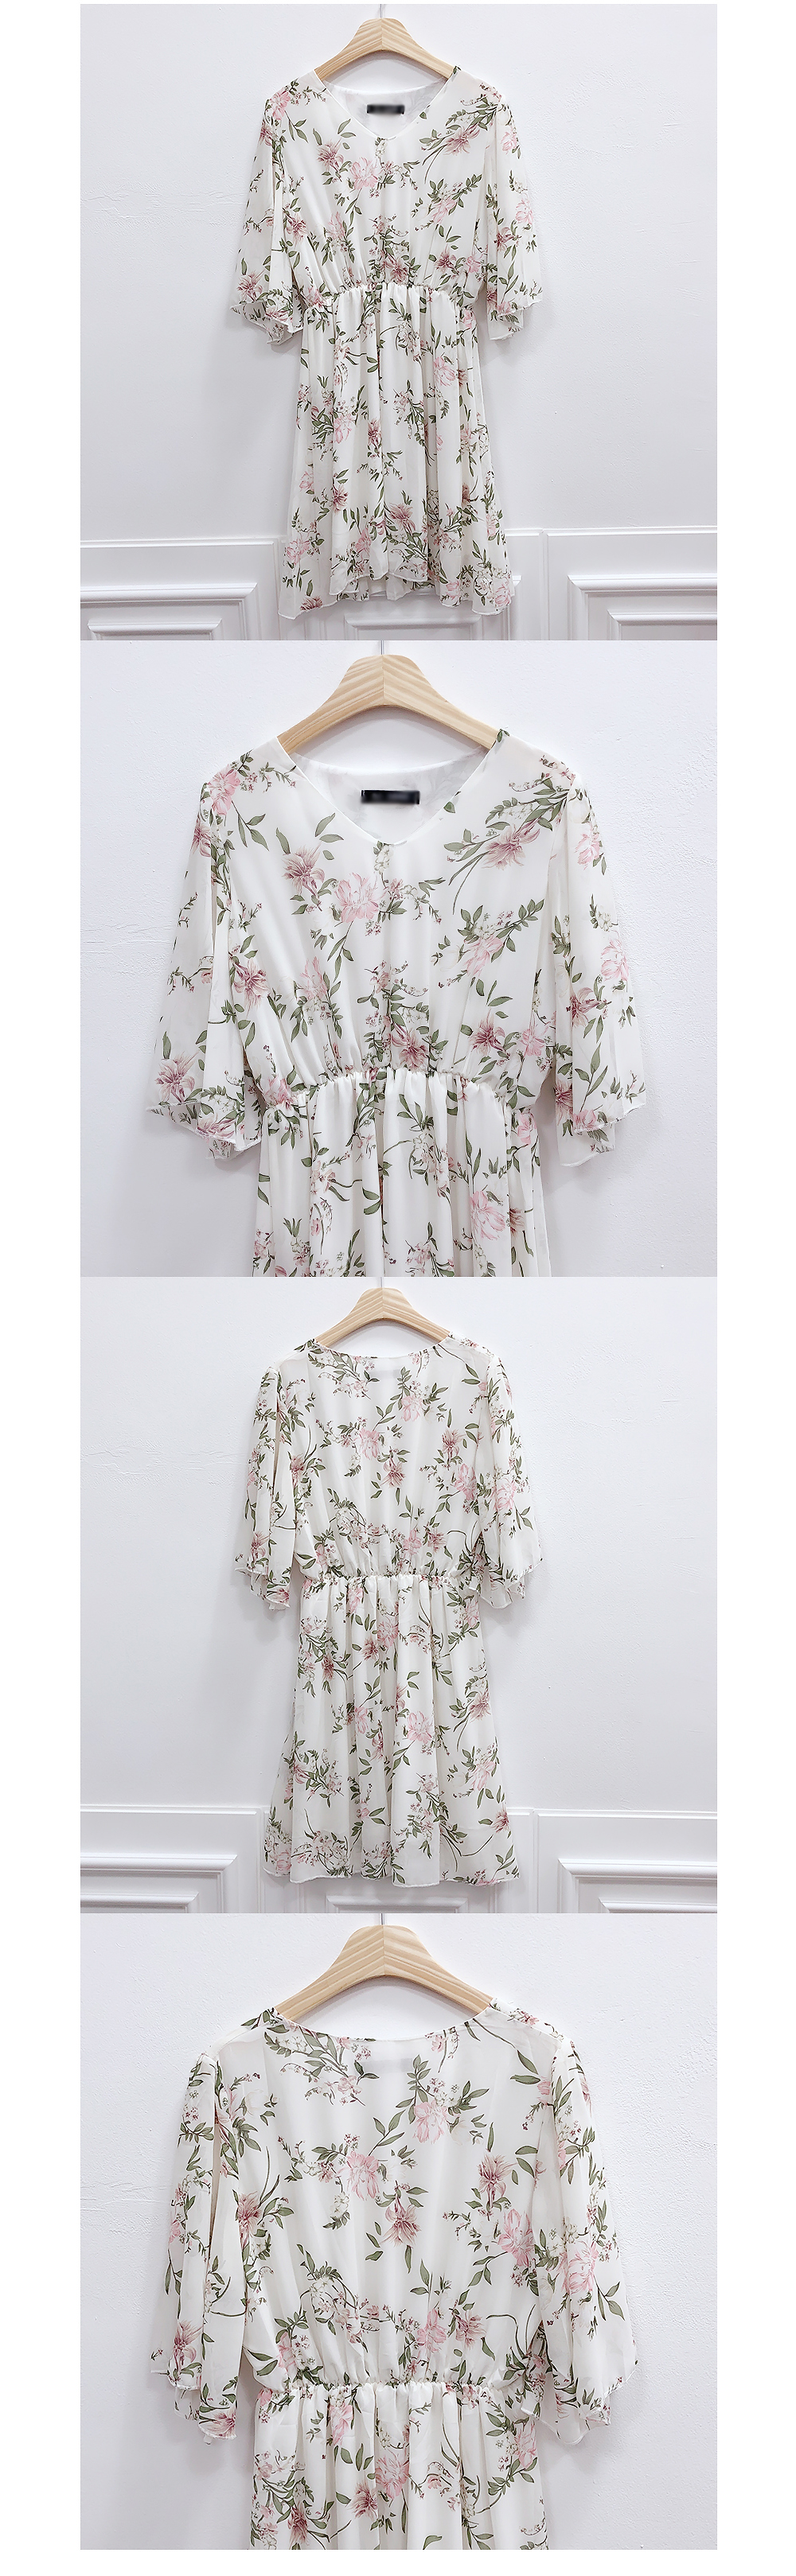 ♥ Blossom Flower Dress